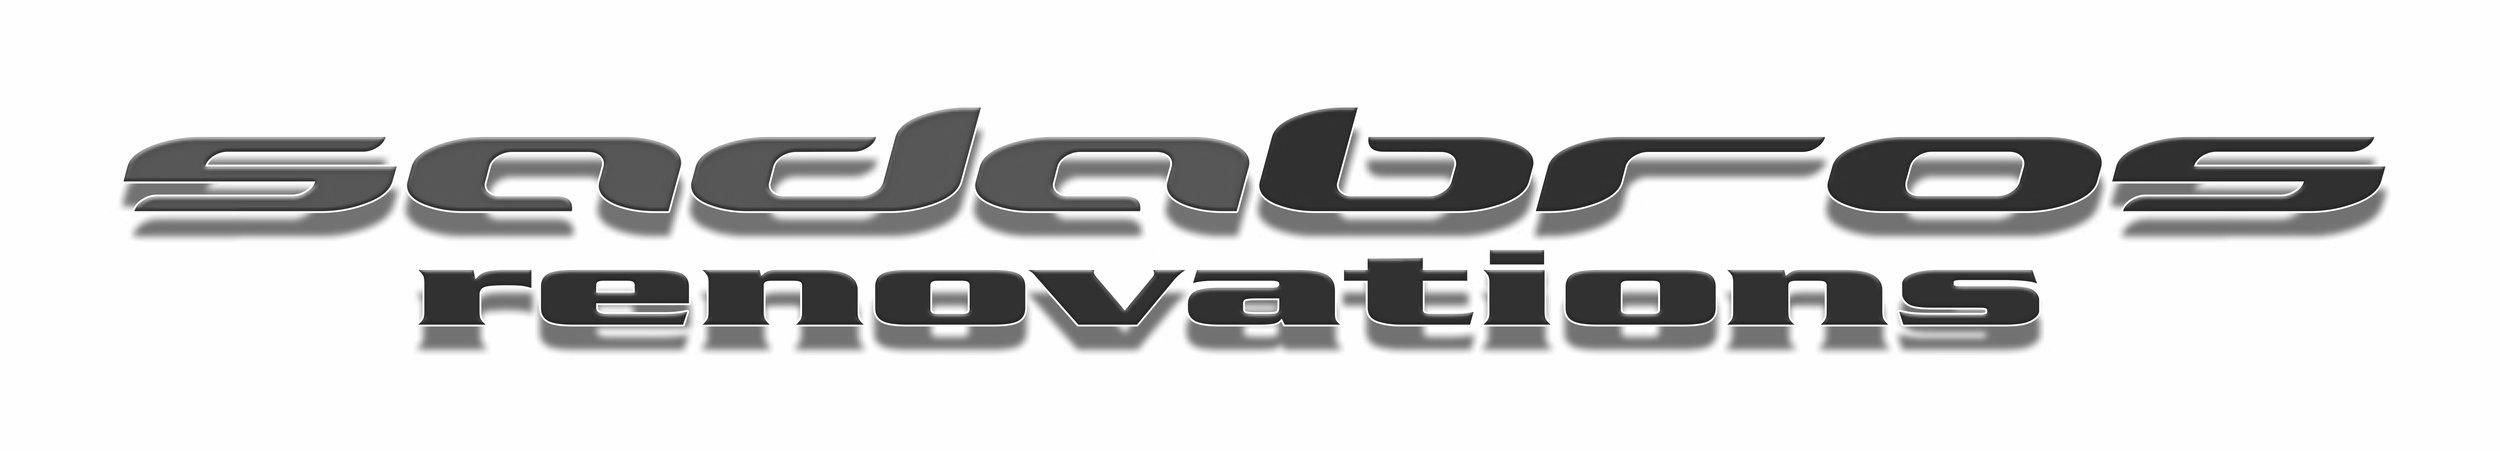 sadabros-logo.jpg